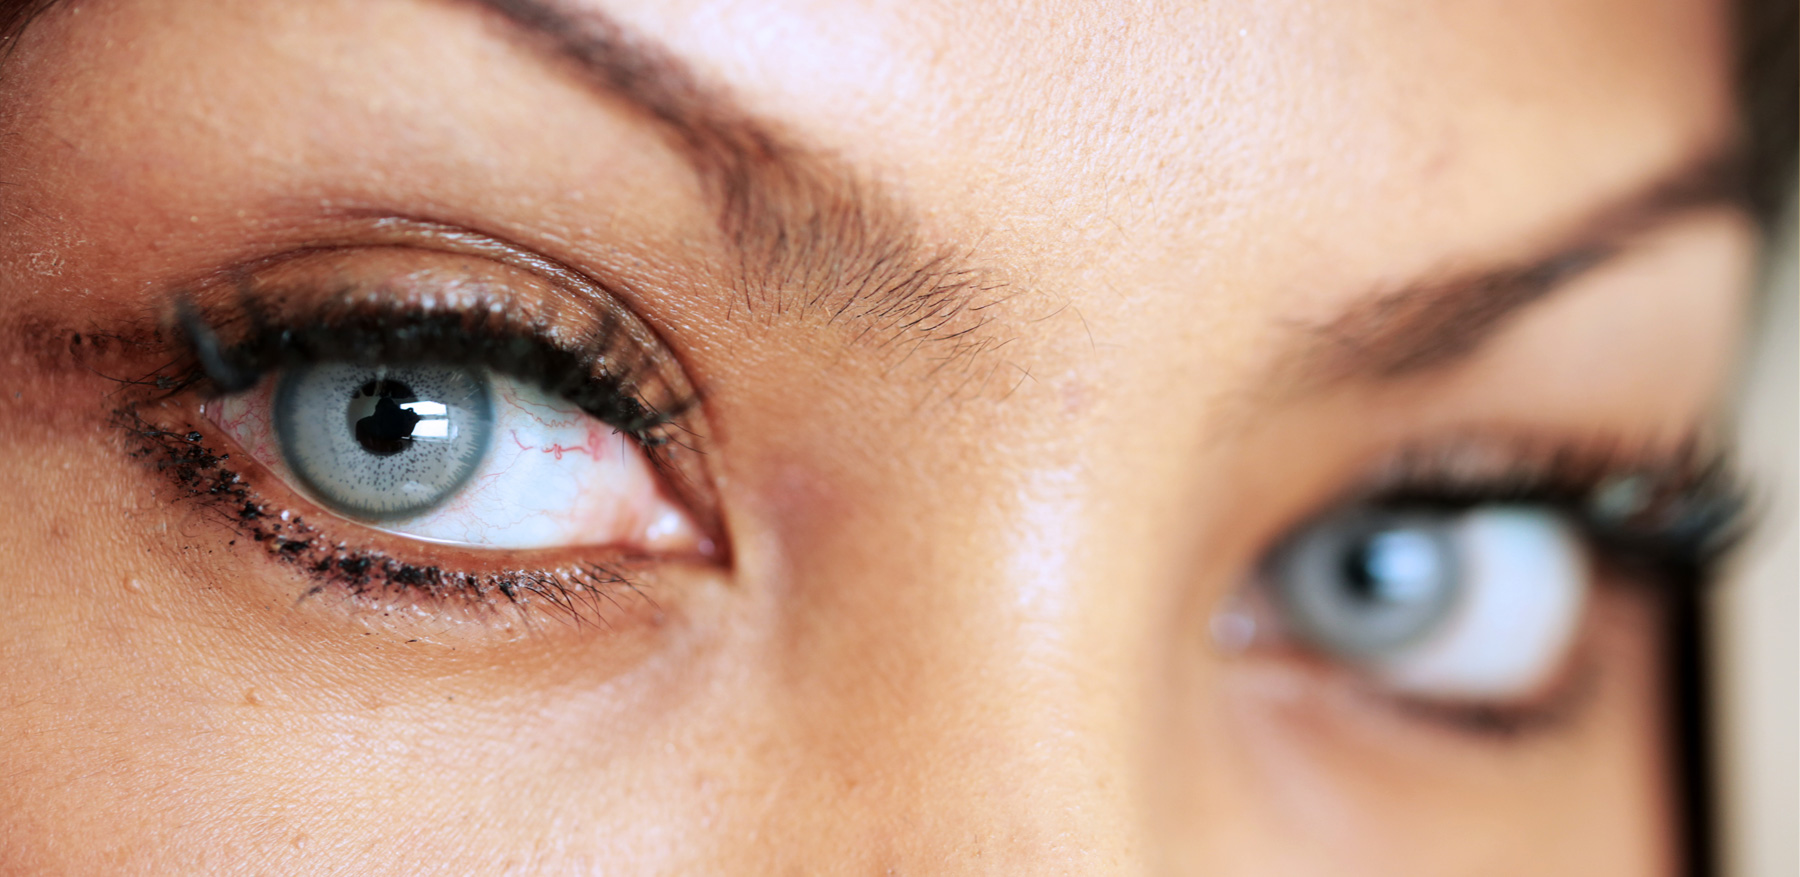 slider3 - عمل های بدون جراحی و روش جراحی چشم ( بلفاروپلاستی)